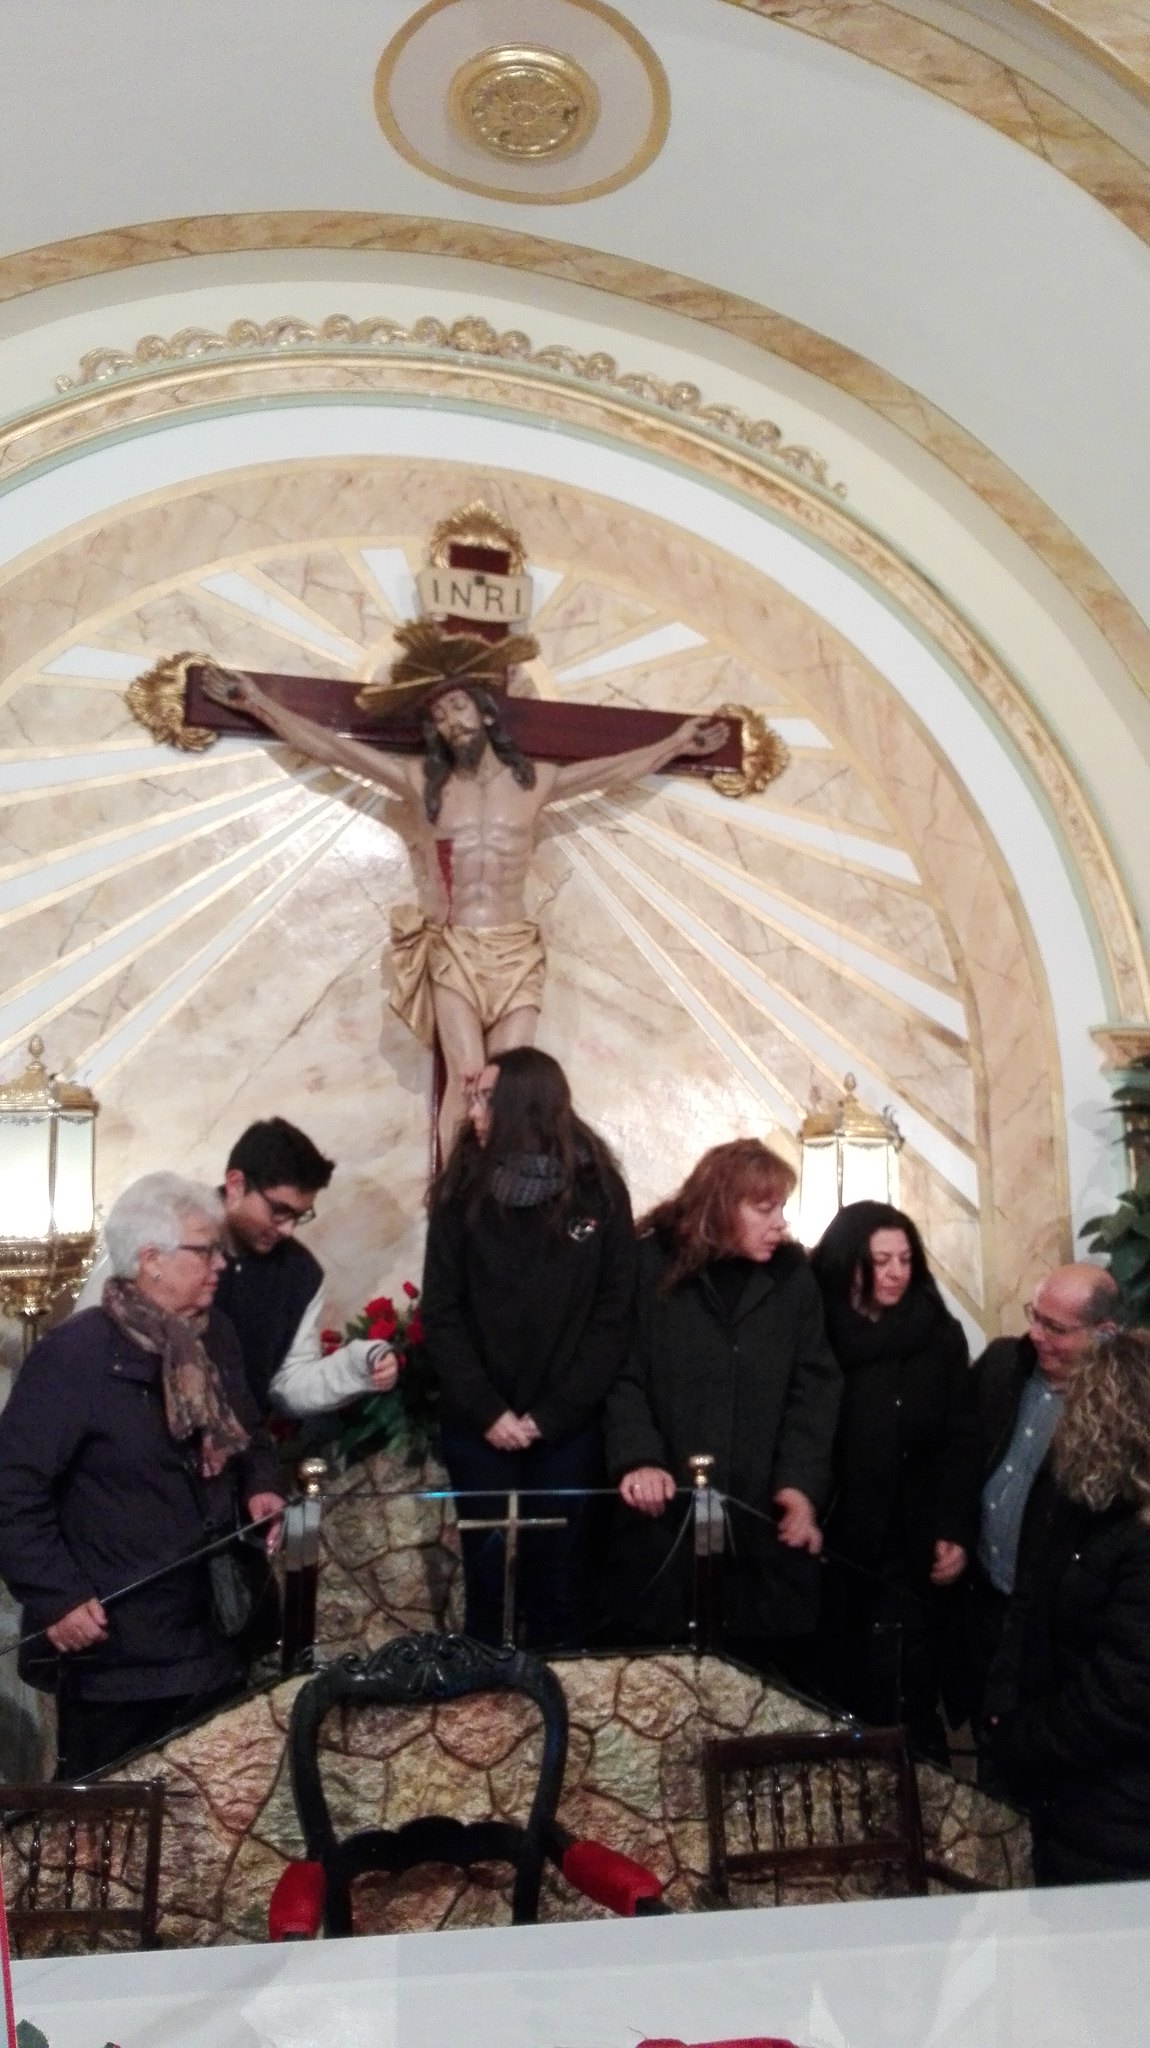 (2016-03-18) - VII Vía Crucis nocturno - Javier Romero Ripoll (125)